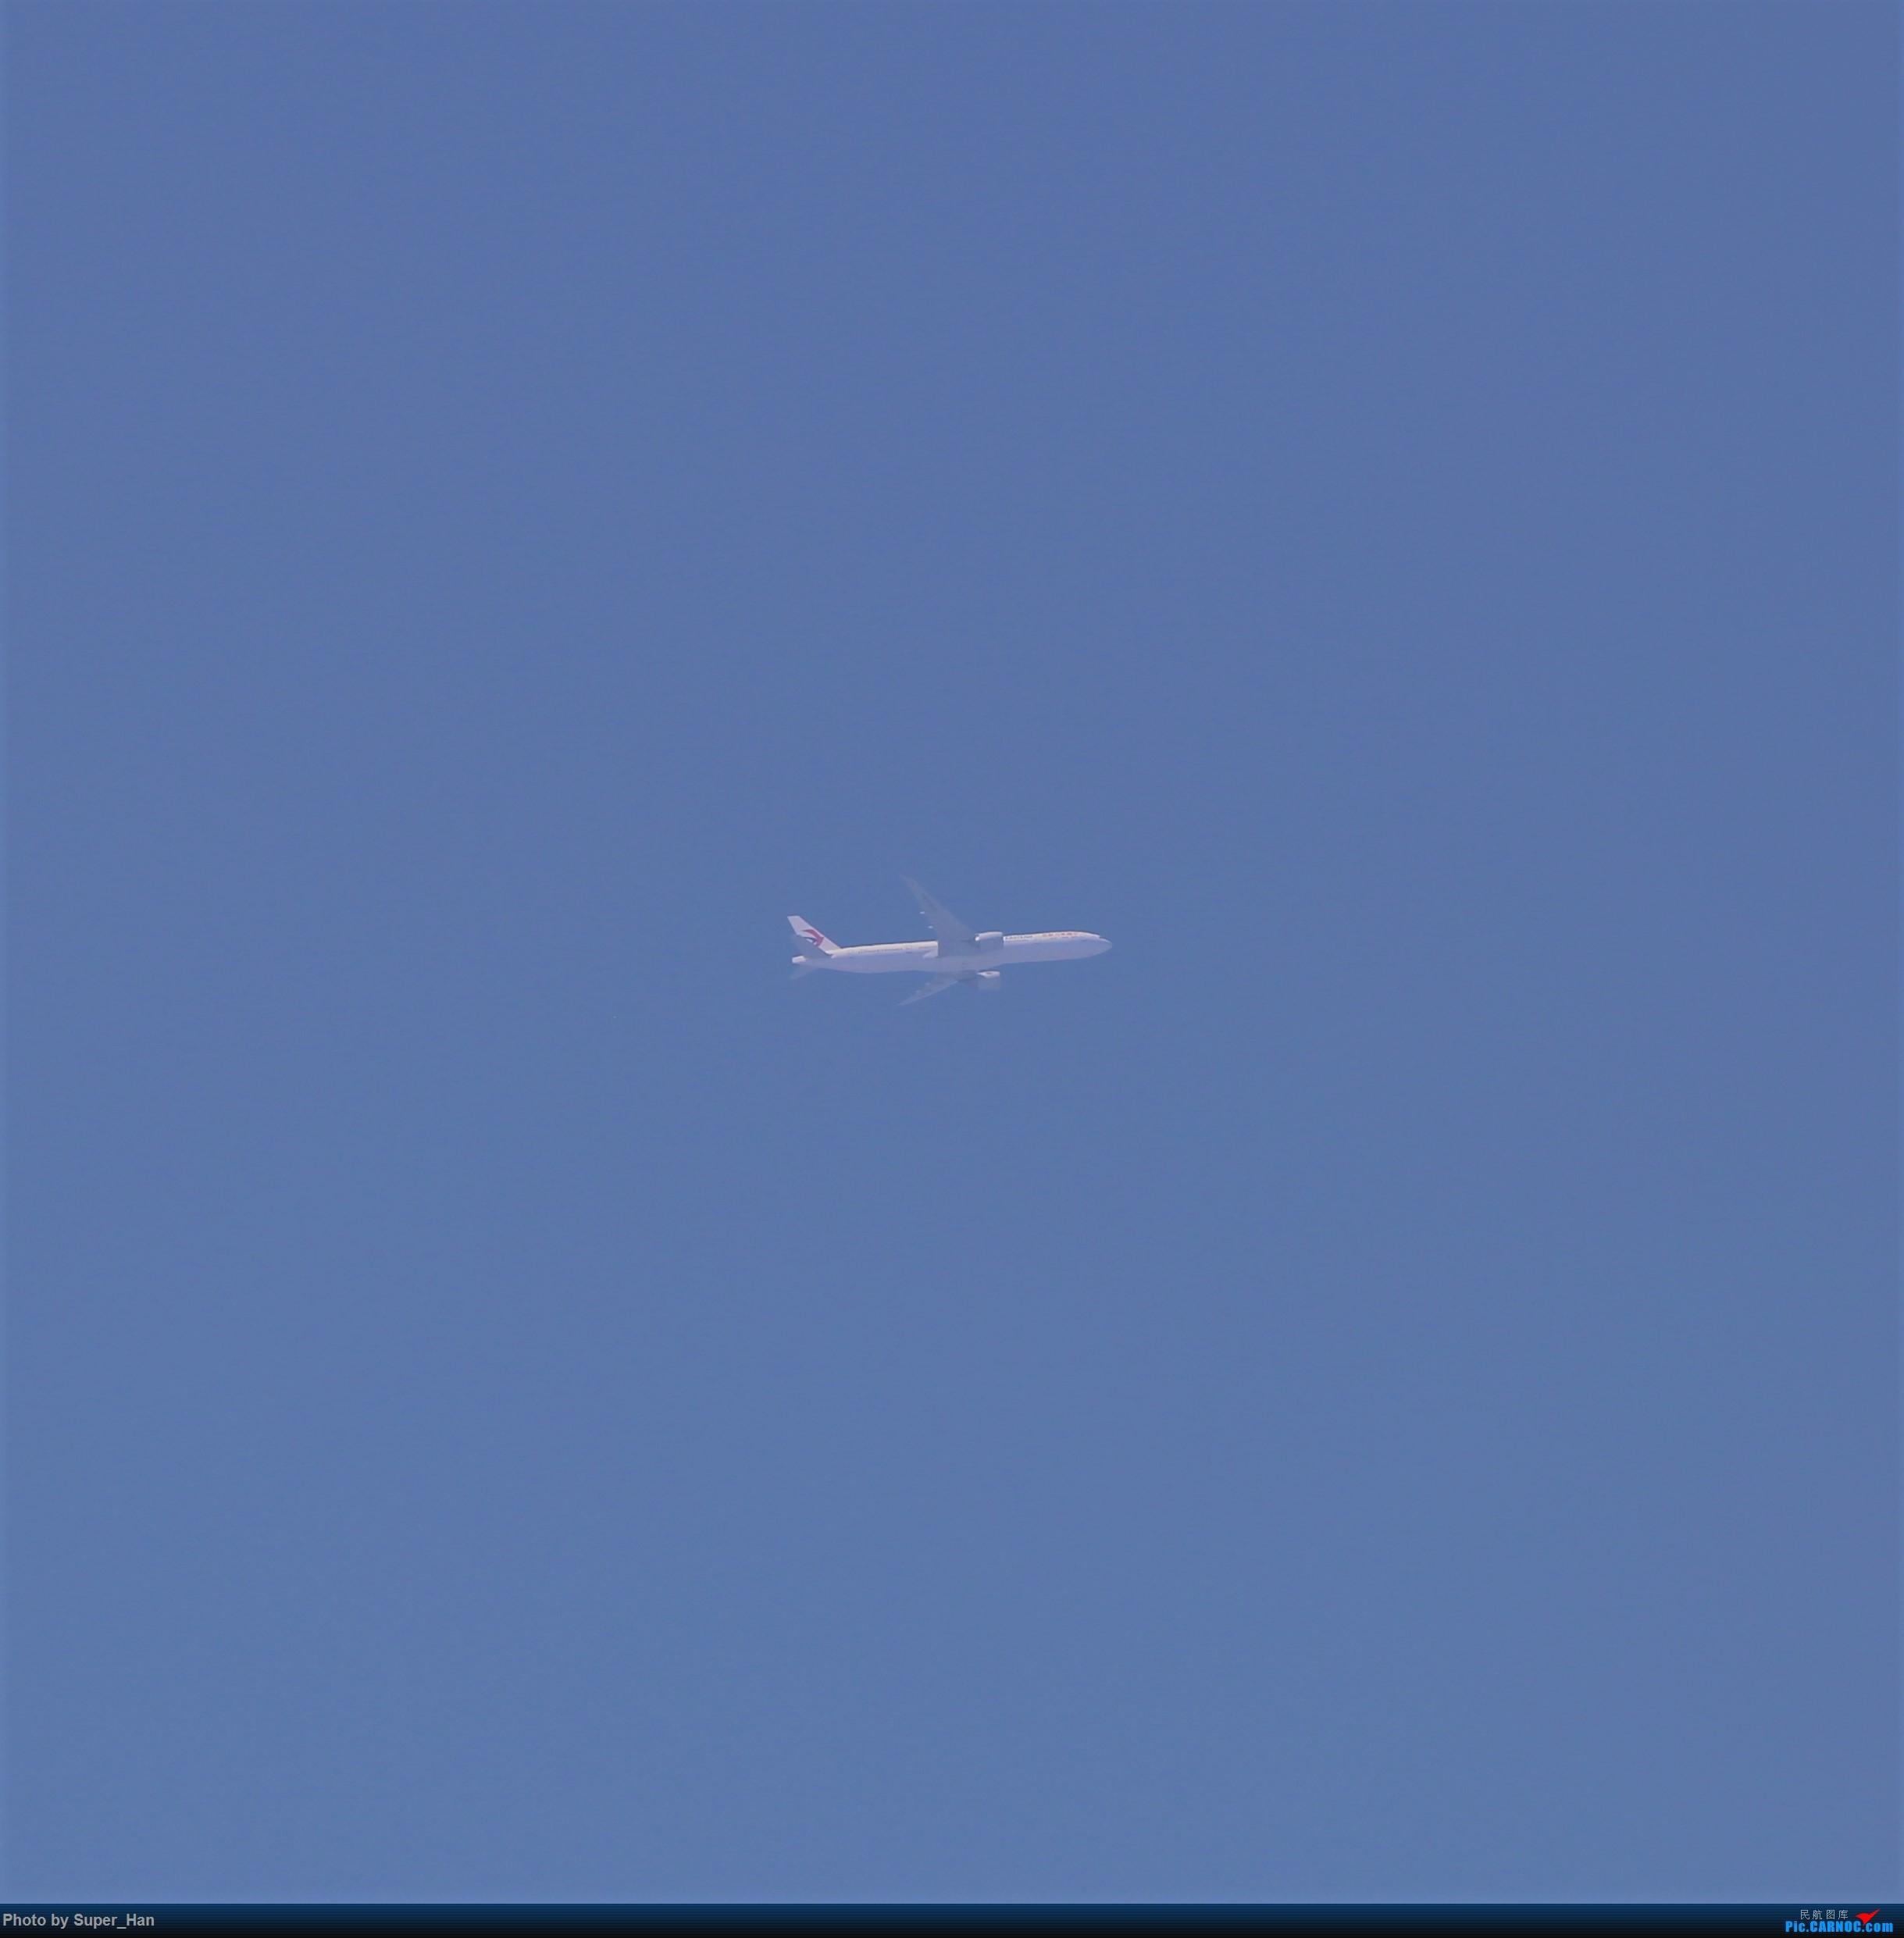 Re:[原创]【杭州飞友会】0715虹桥头顶降PVG的重型机 BOEING 777-300ER  中国上海虹桥国际机场